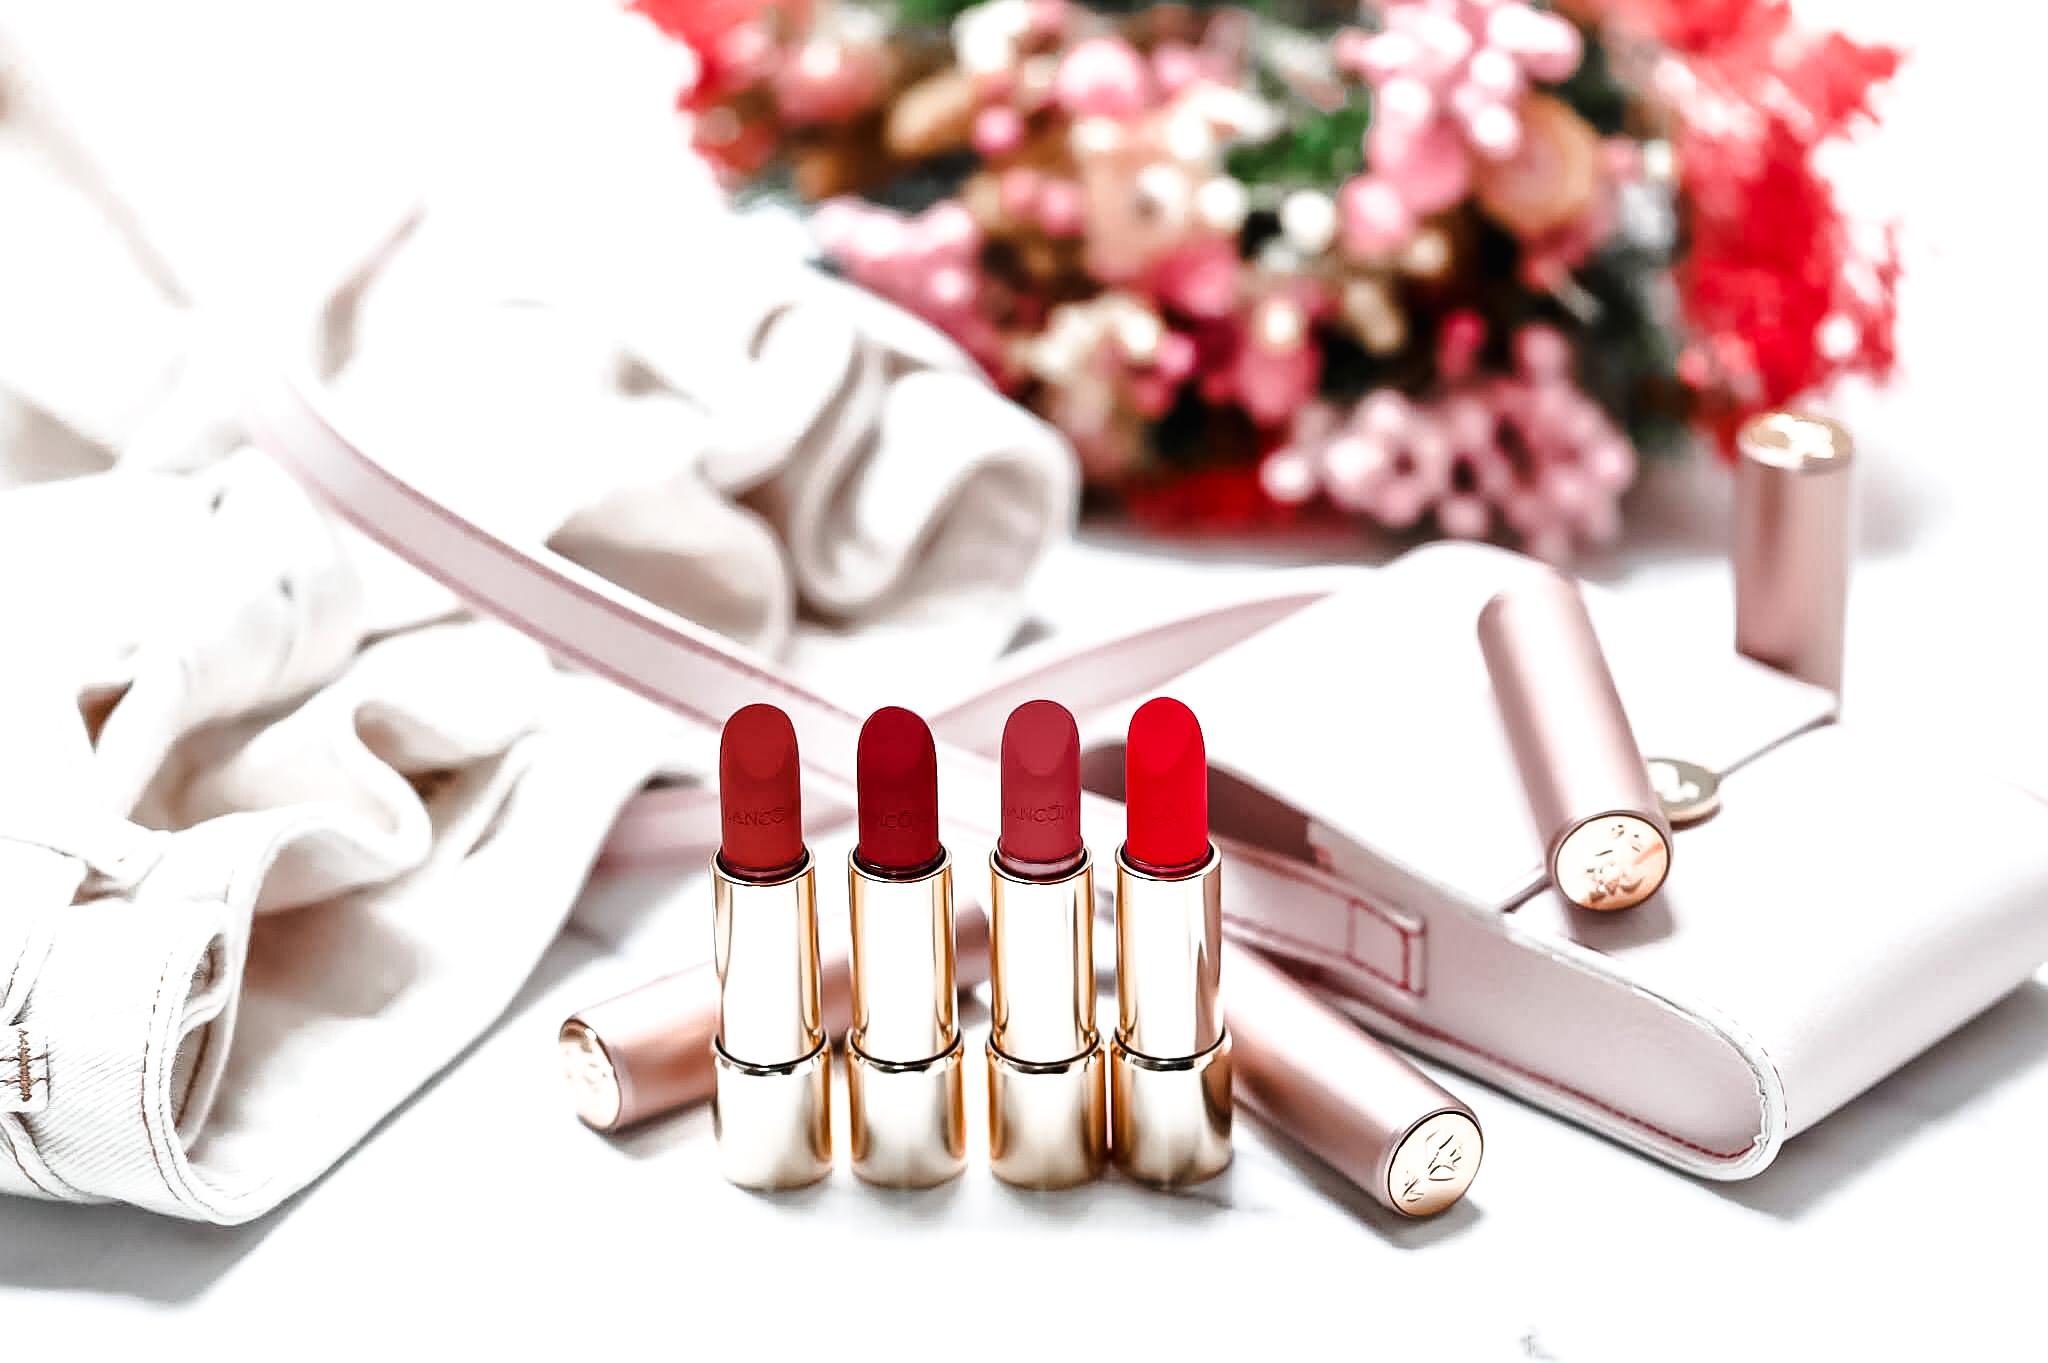 Lancôme Labsolu rouge intimatte 130 not flirting 274 killing-me-softly 196 pleasure firt 169 love rendez vous swatch